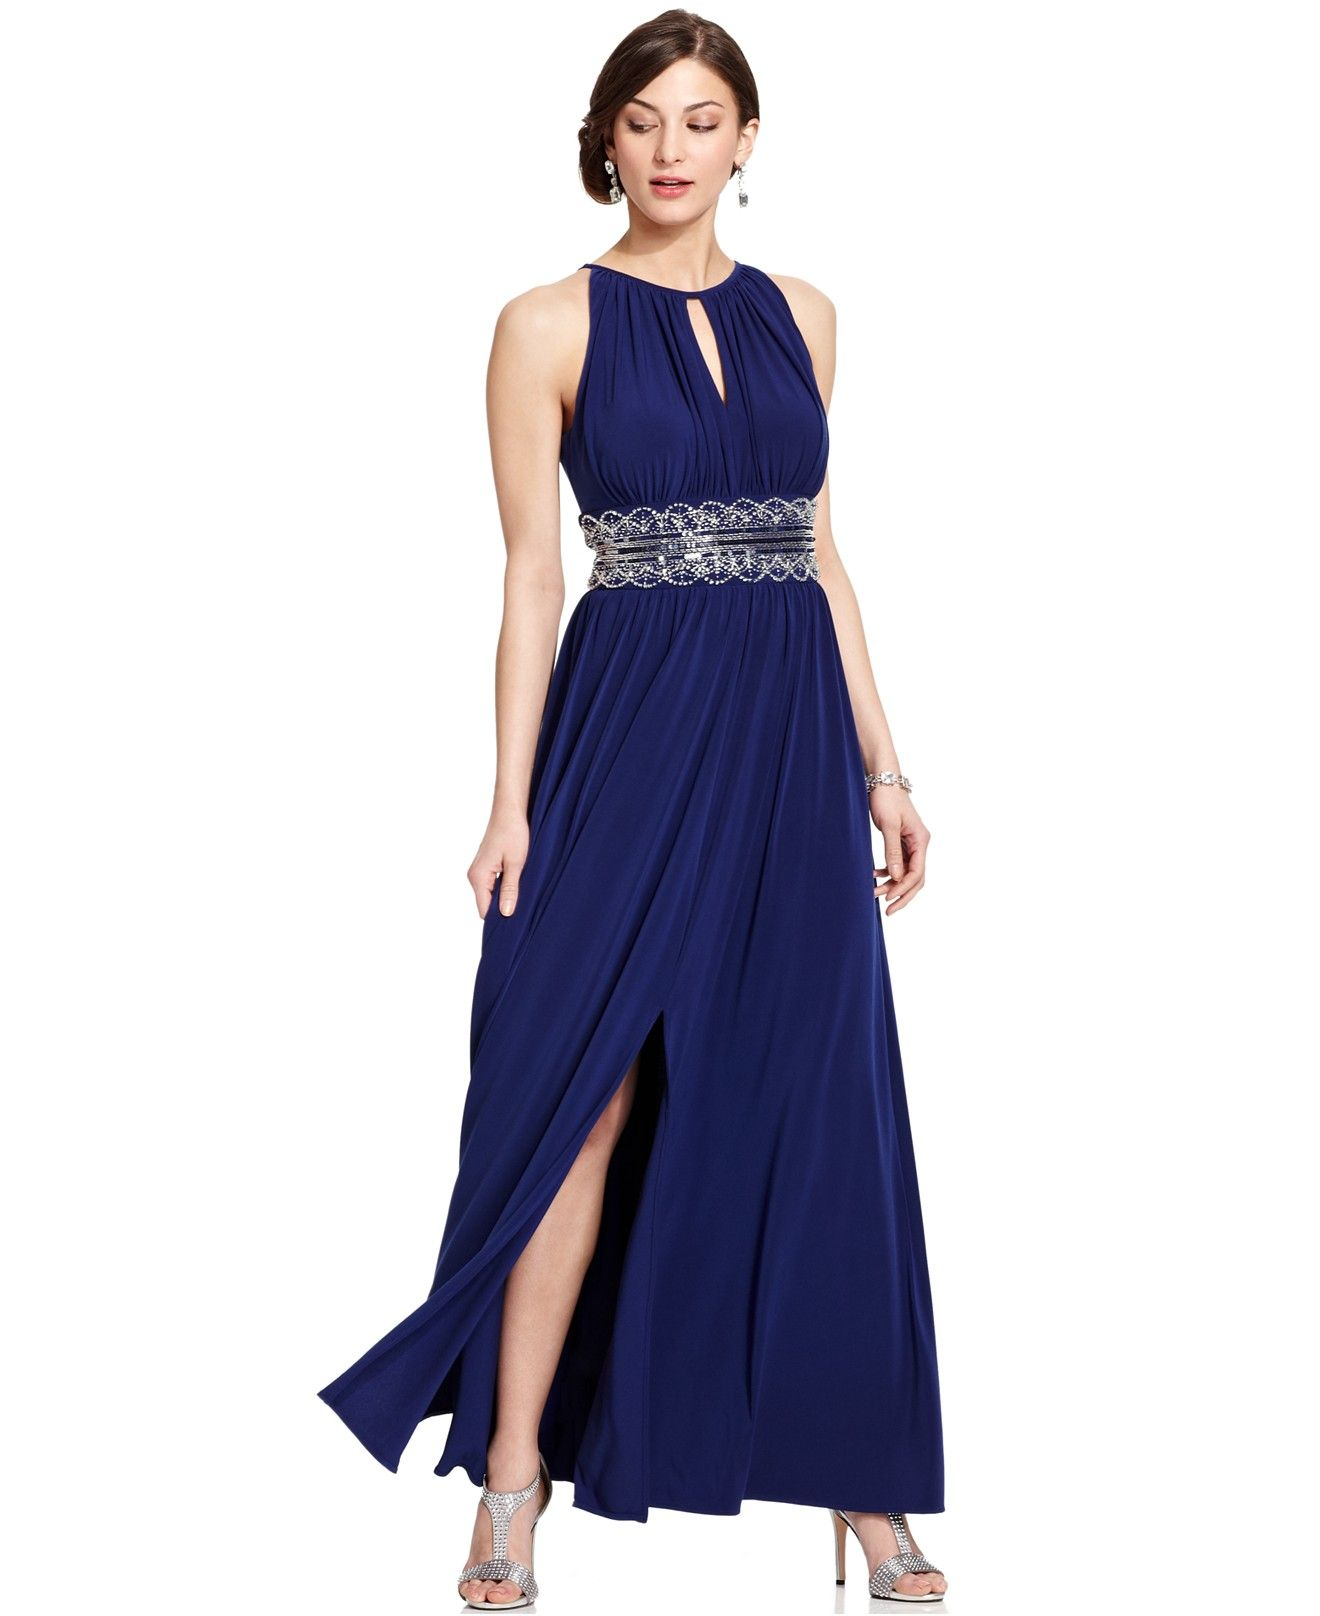 212ee427e1 R M Richards Petite Sleeveless Beaded Gown - Dresses - Women - Macy s